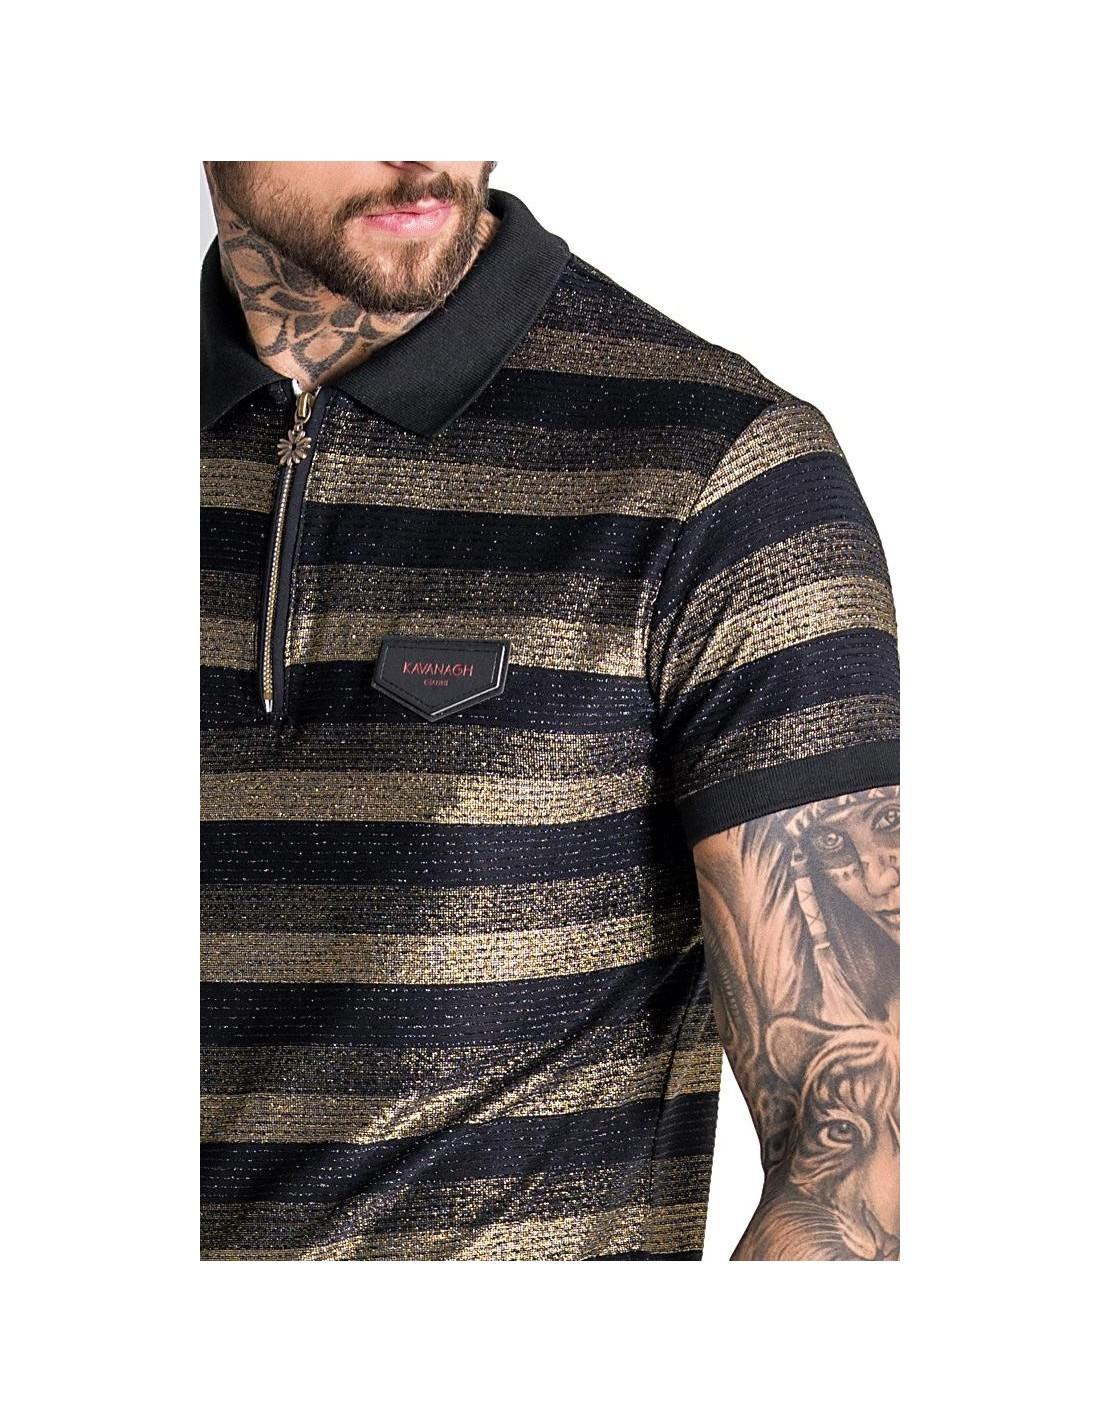 Camiseta Gianni Kavanagh negra rayas con logo bordado